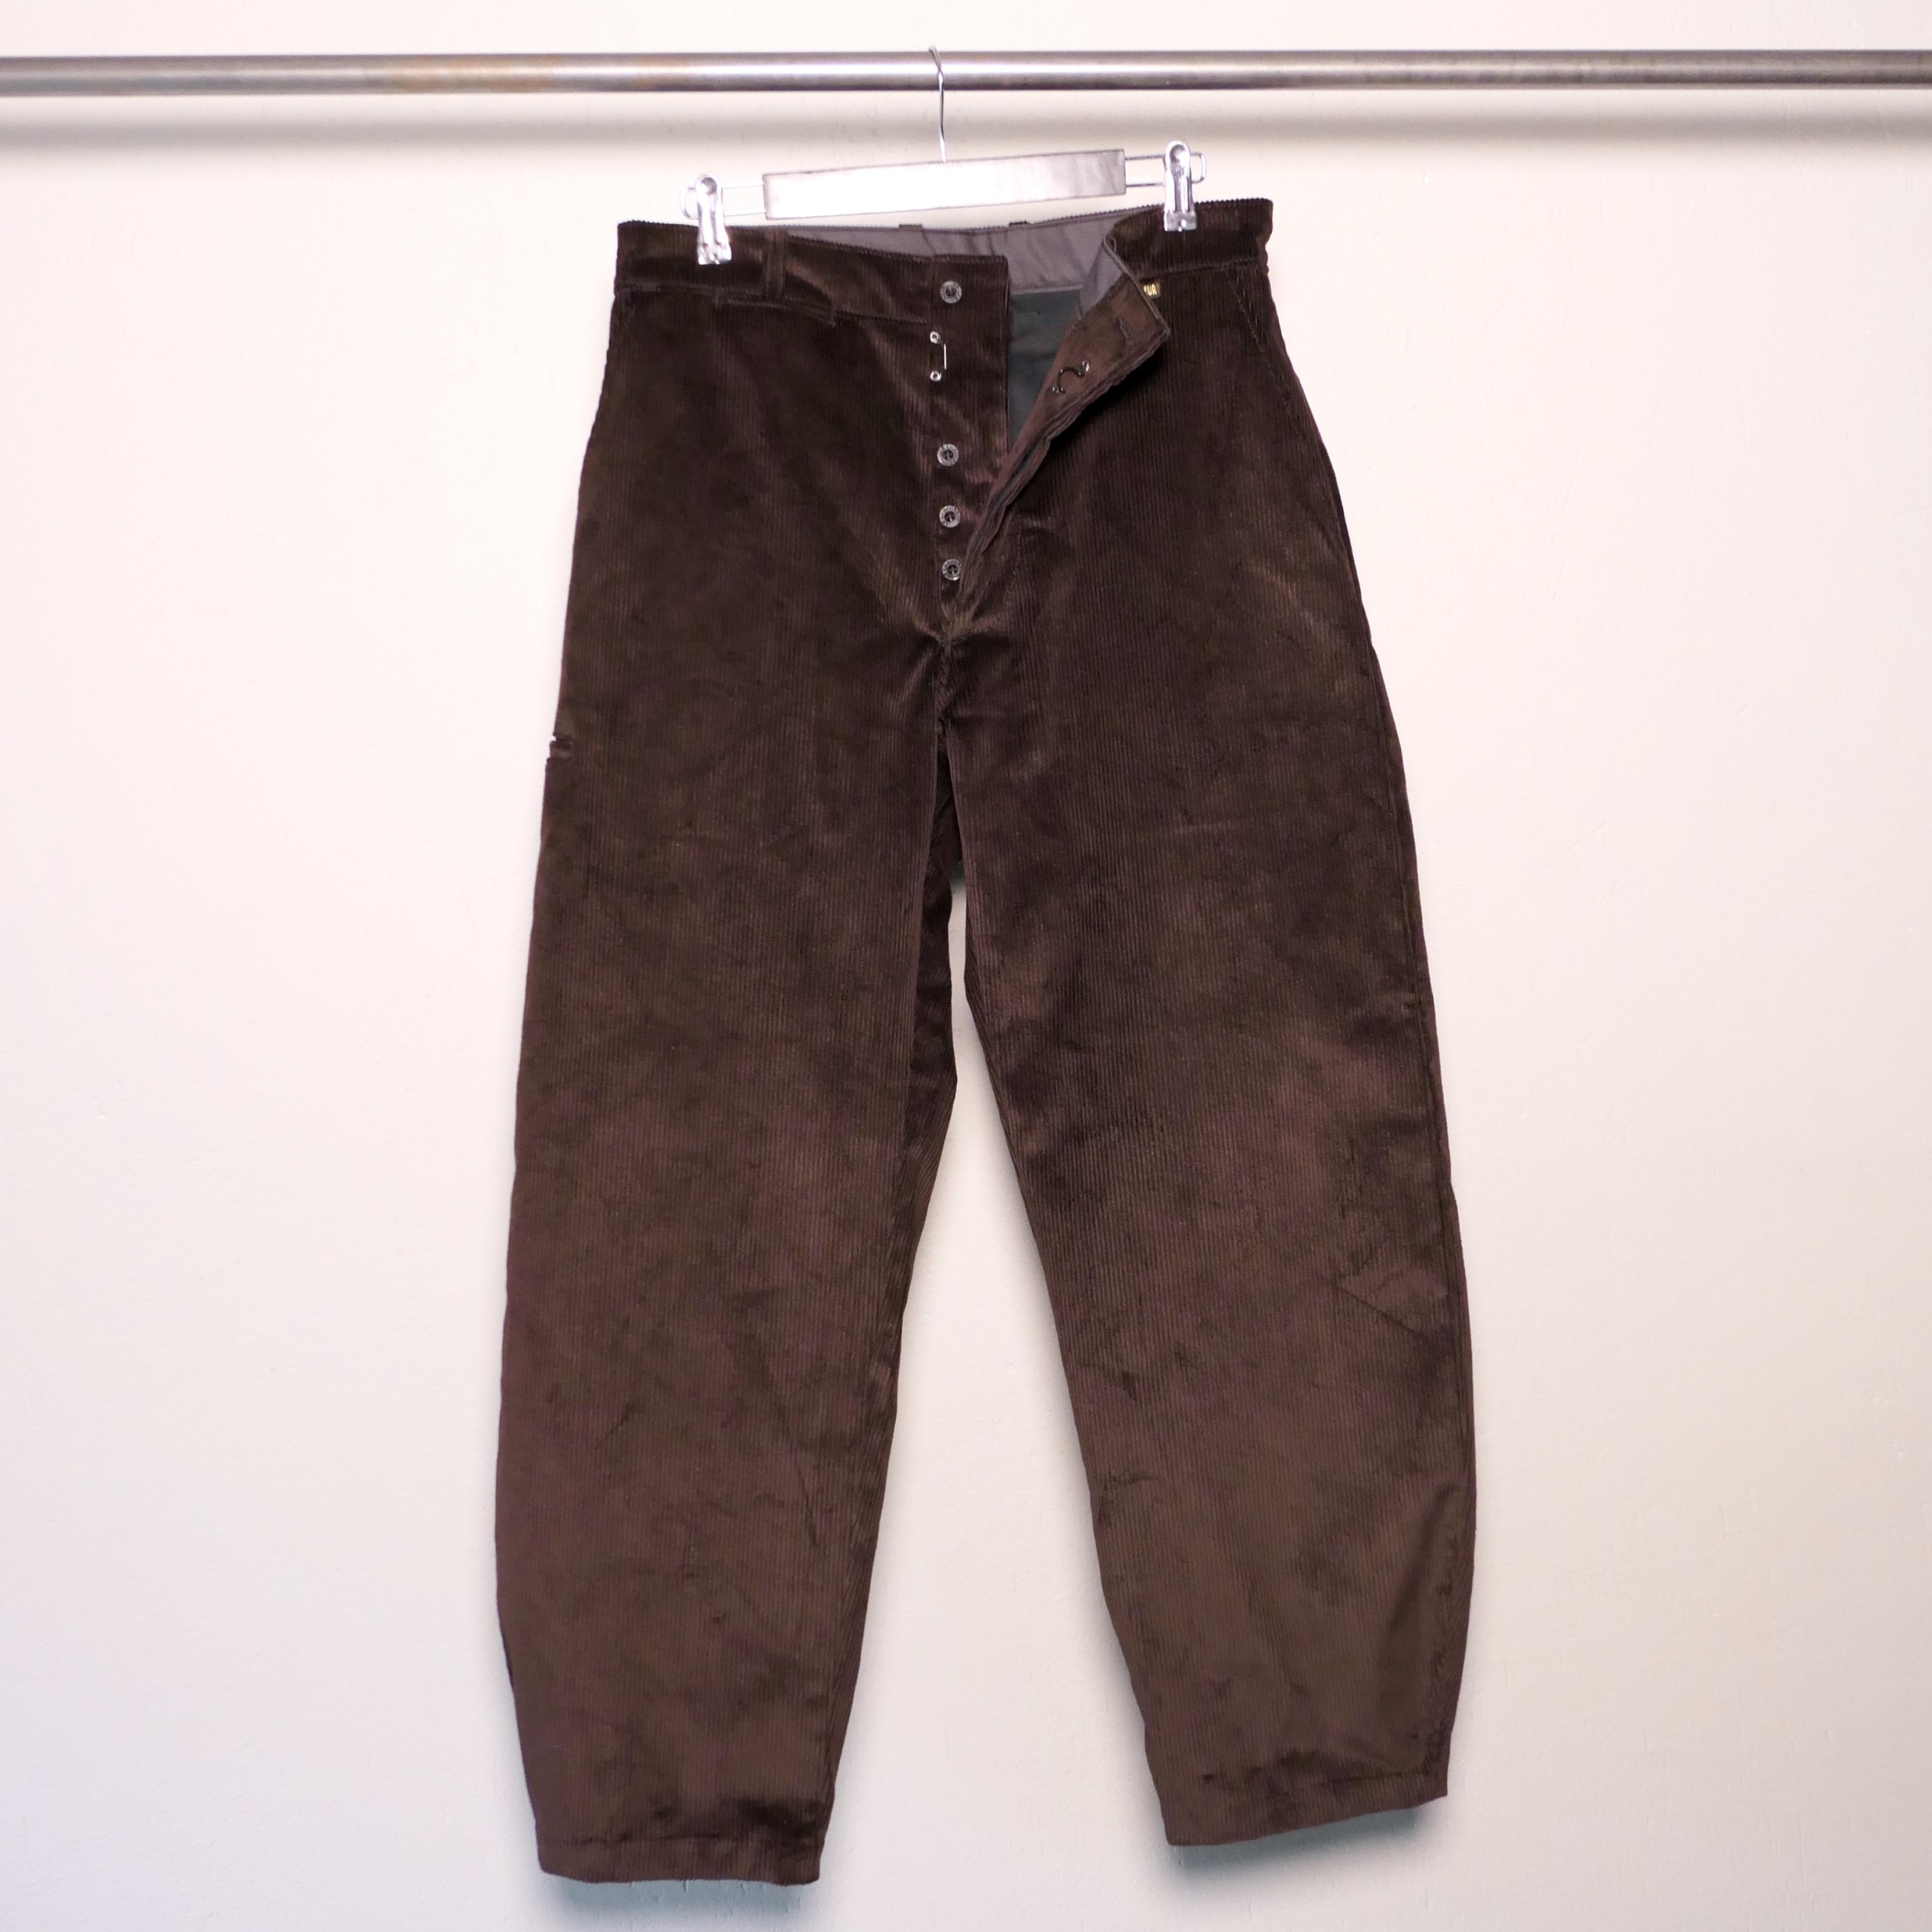 Corduroy Craftsman pants brown